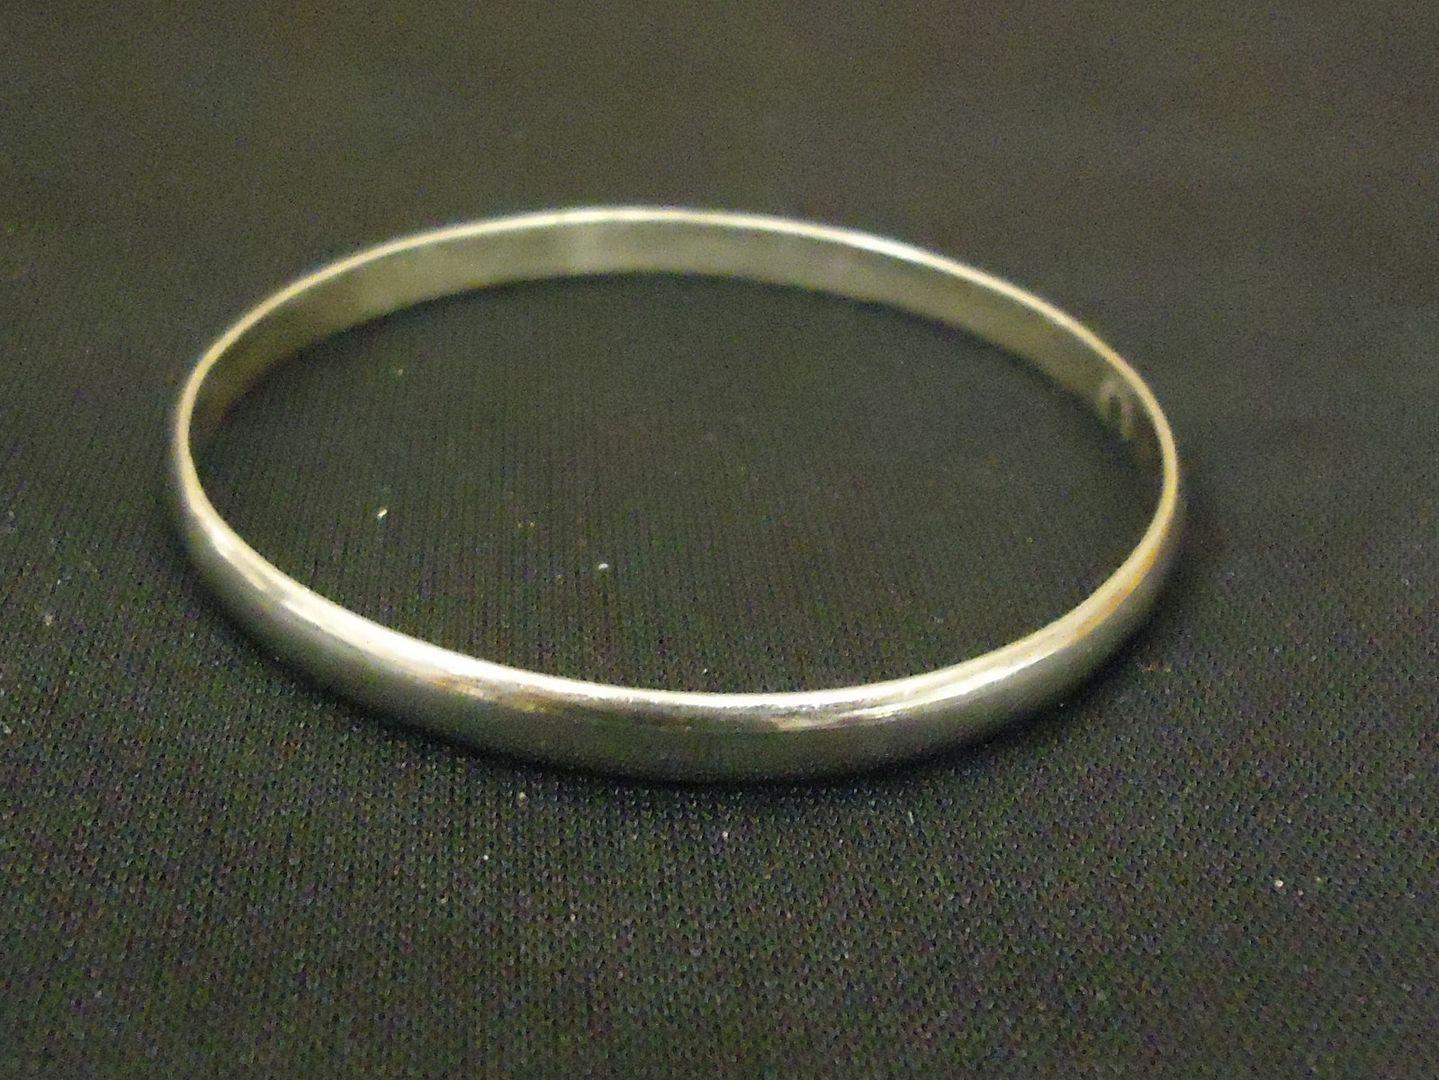 lm7410 112712-578n Designer Fashion Bracelet 2 1/2in Diameter Bangle Metal Female Adult Silvers